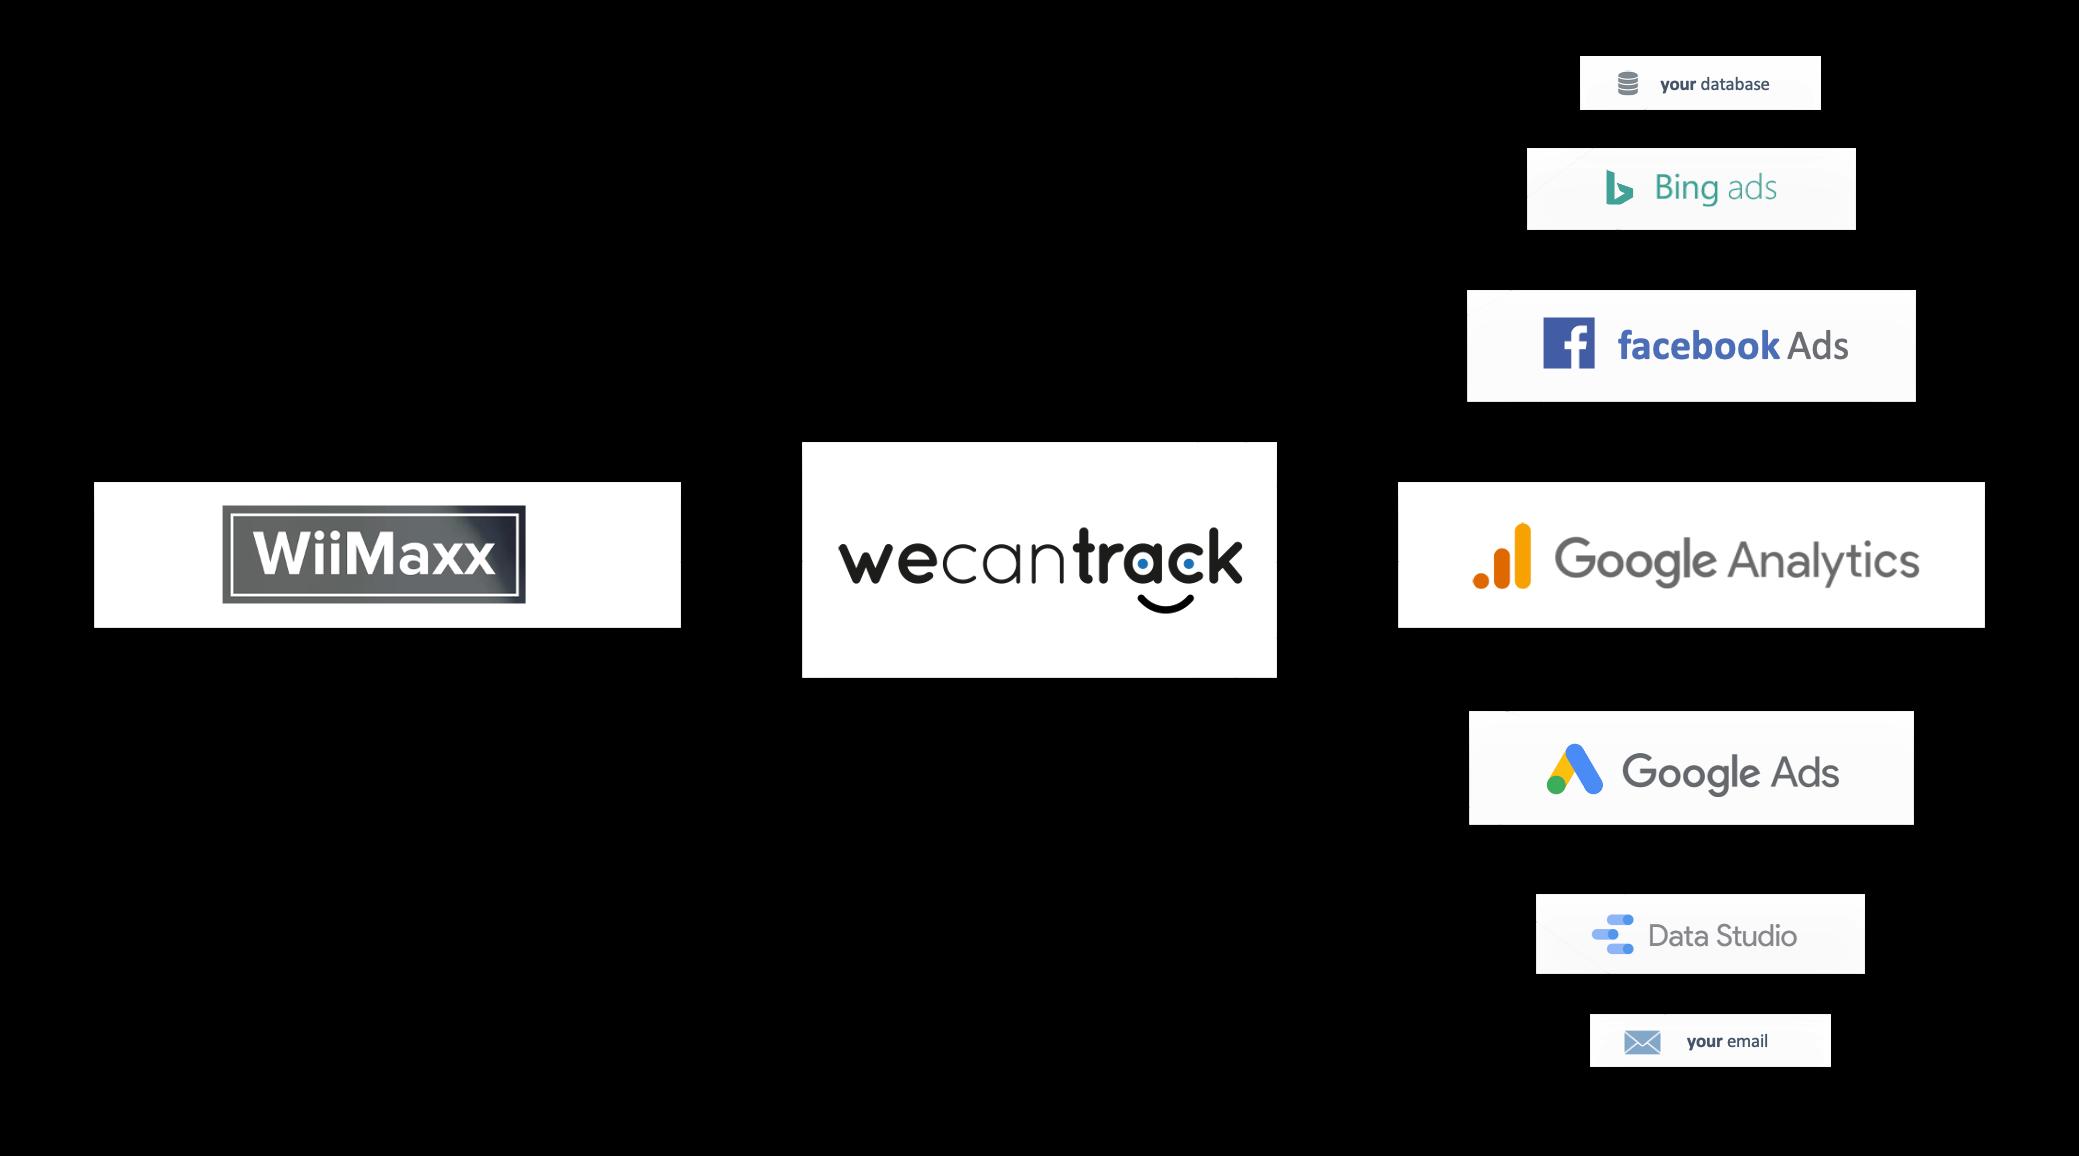 integrate-wiimaxx-affiliate-conversions-via-postback-url